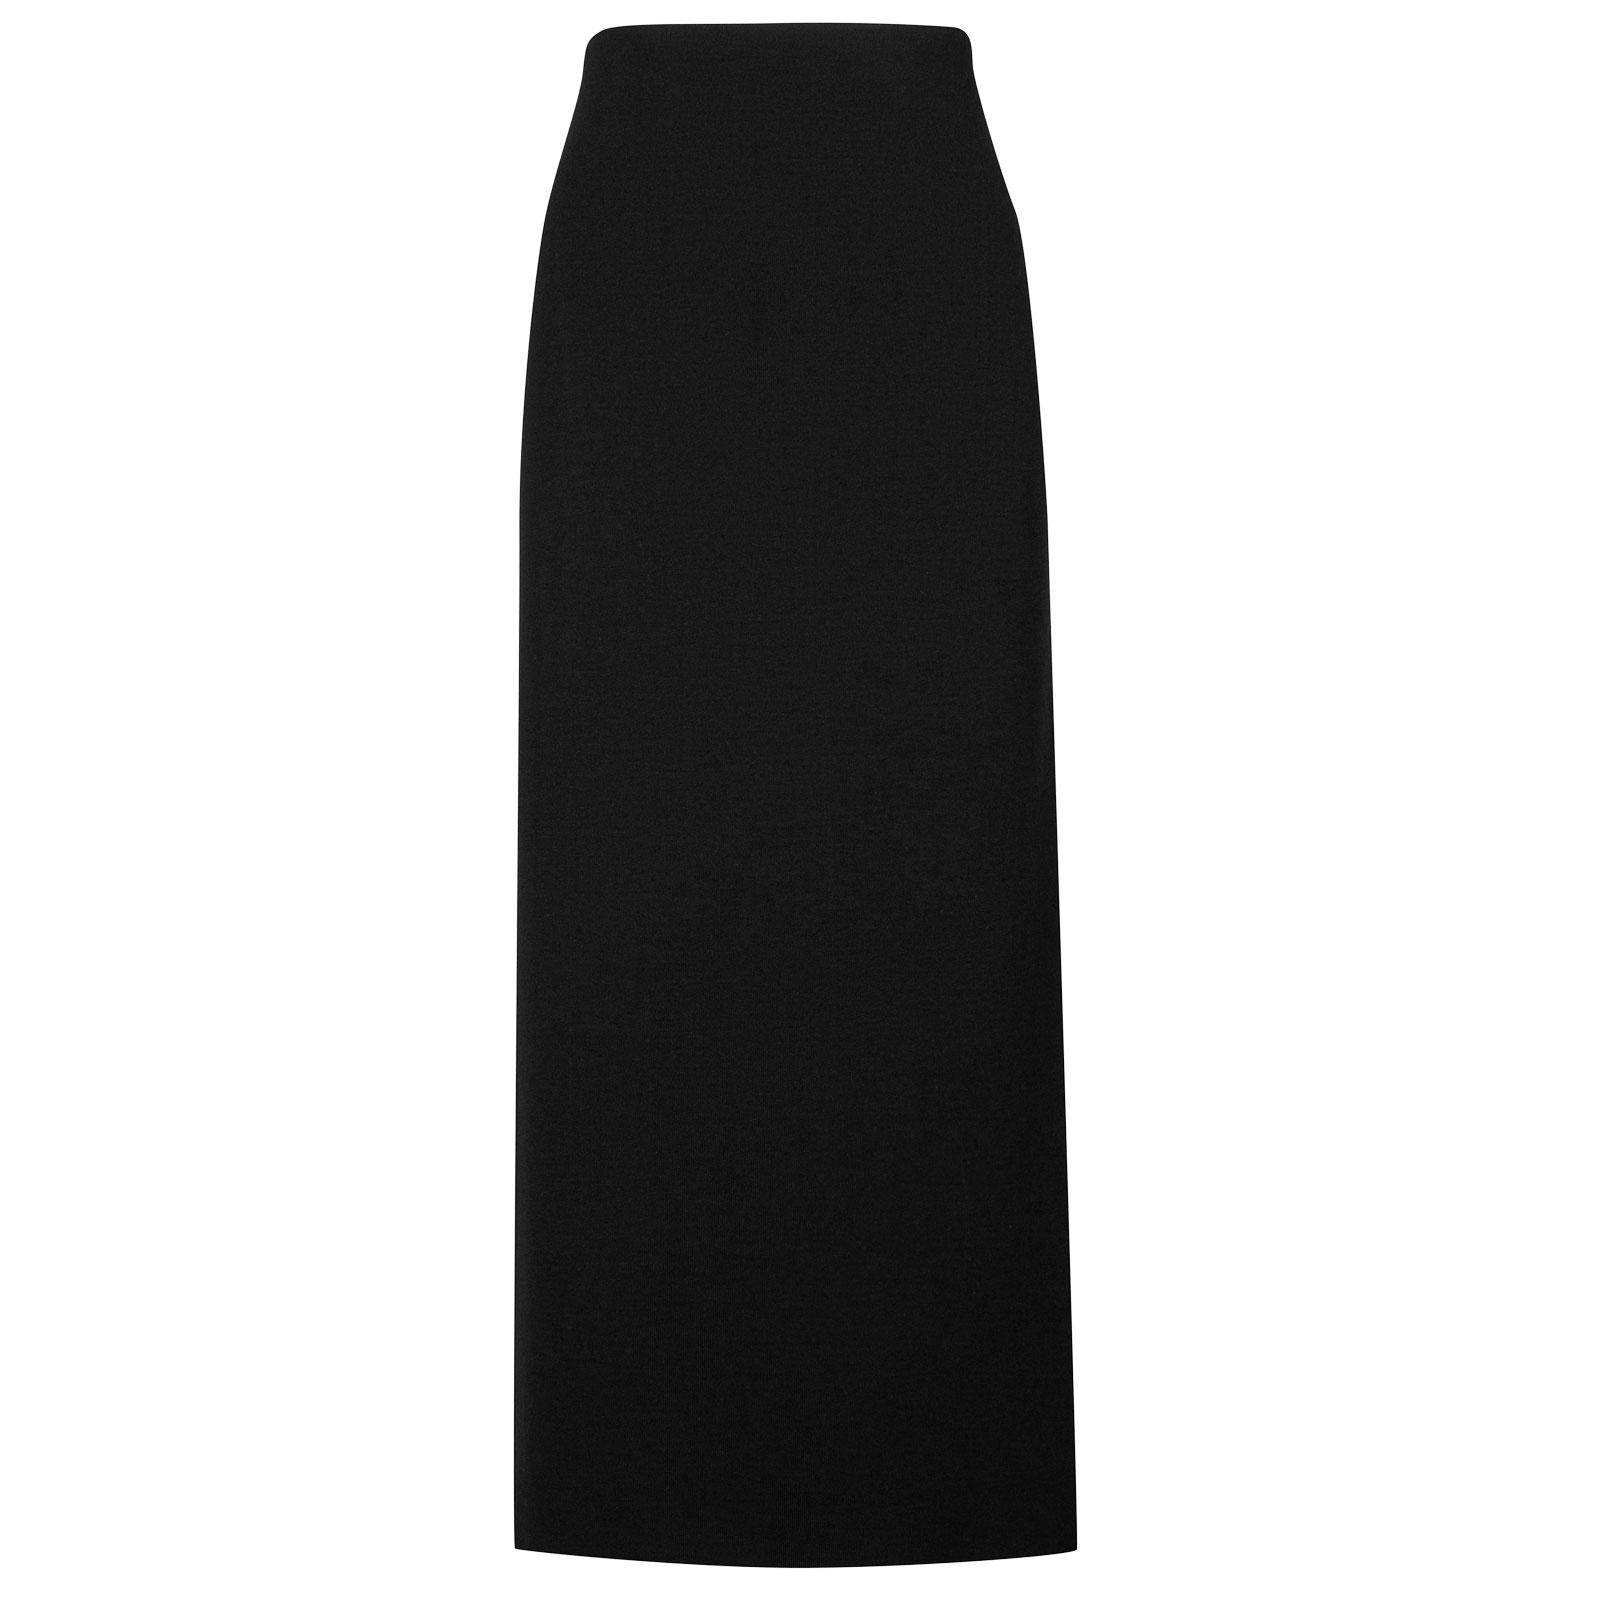 John Smedley moran Merino Wool Skirt in Black-S